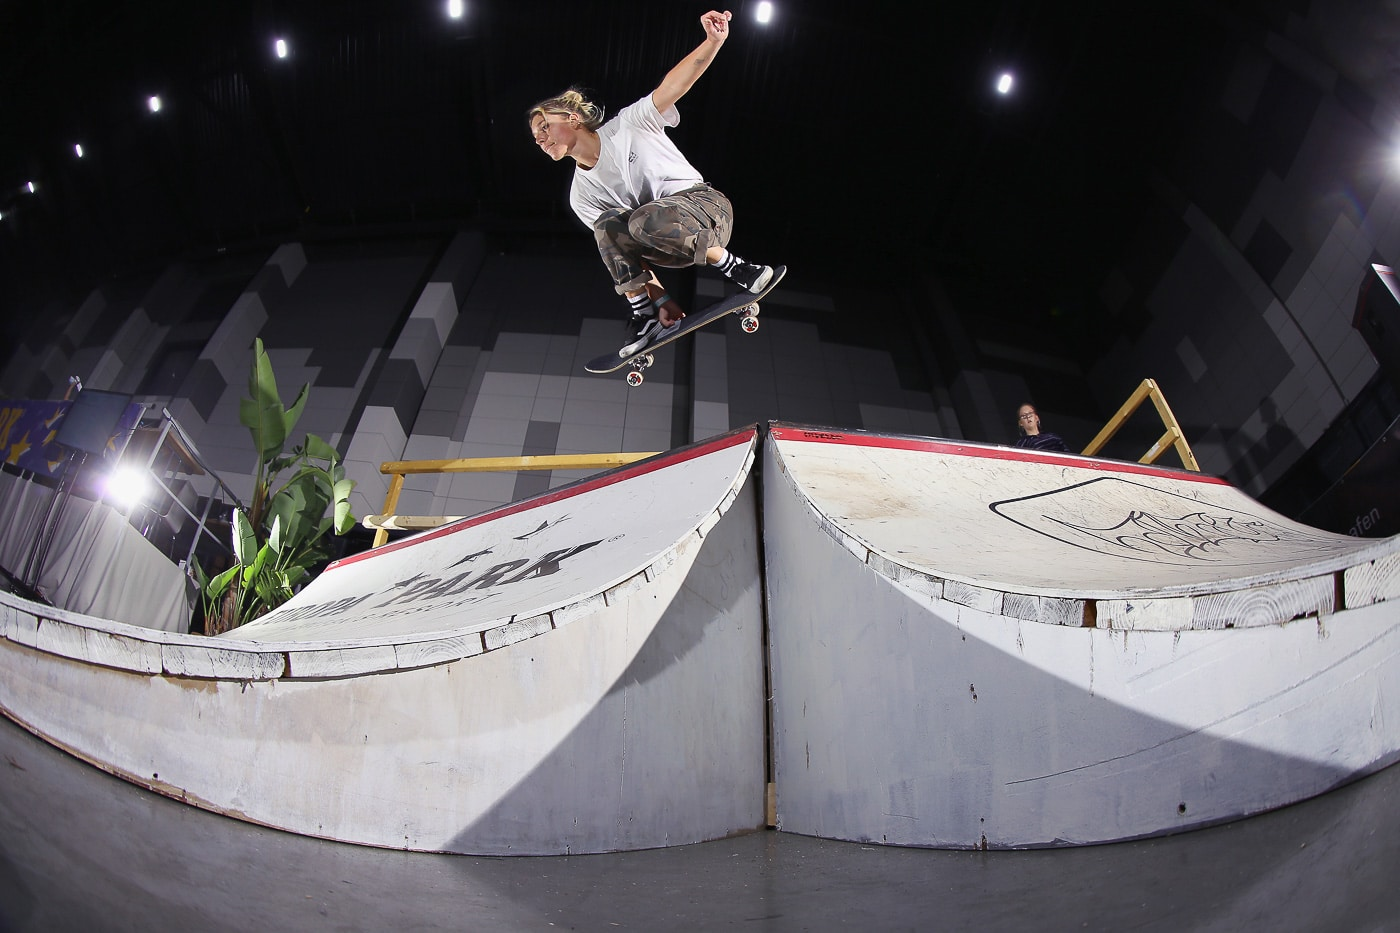 Club-of-skaters-cos-europapark-Thomas-Gentsch-photo-irregularskatemag-6